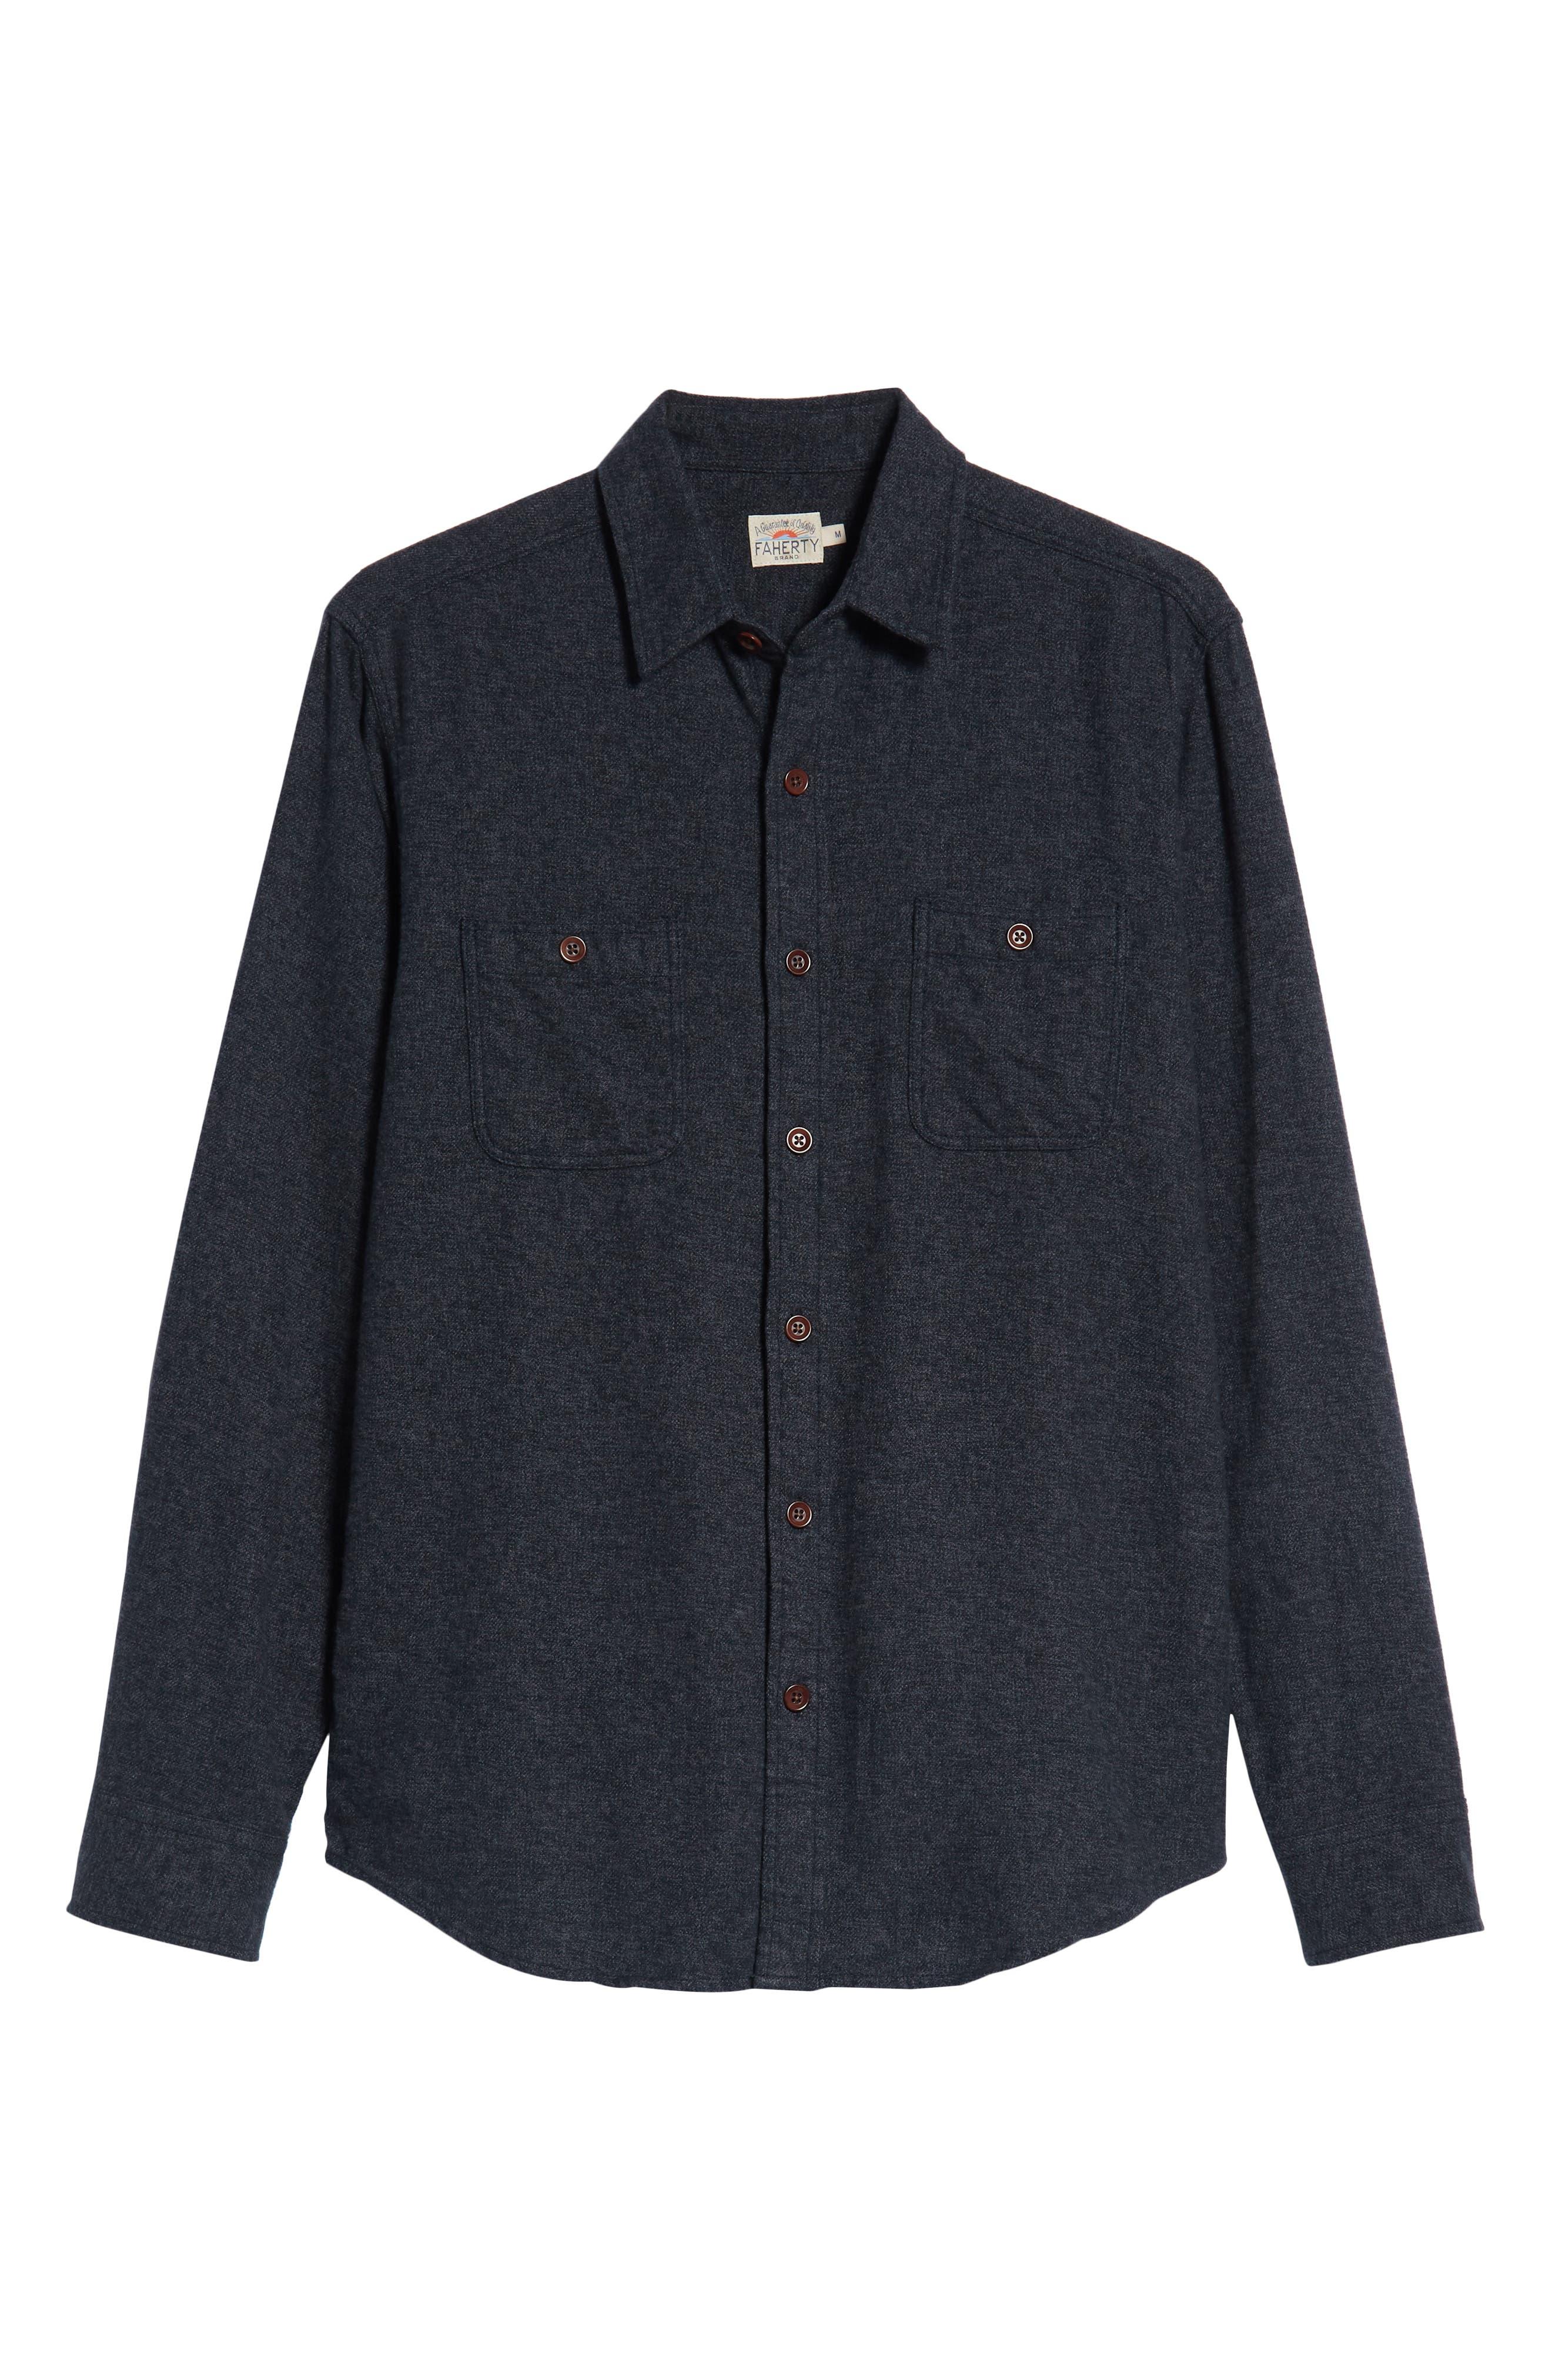 Seasons Organic Cotton Flannel Sport Shirt,                             Alternate thumbnail 5, color,                             WASHED BLACK